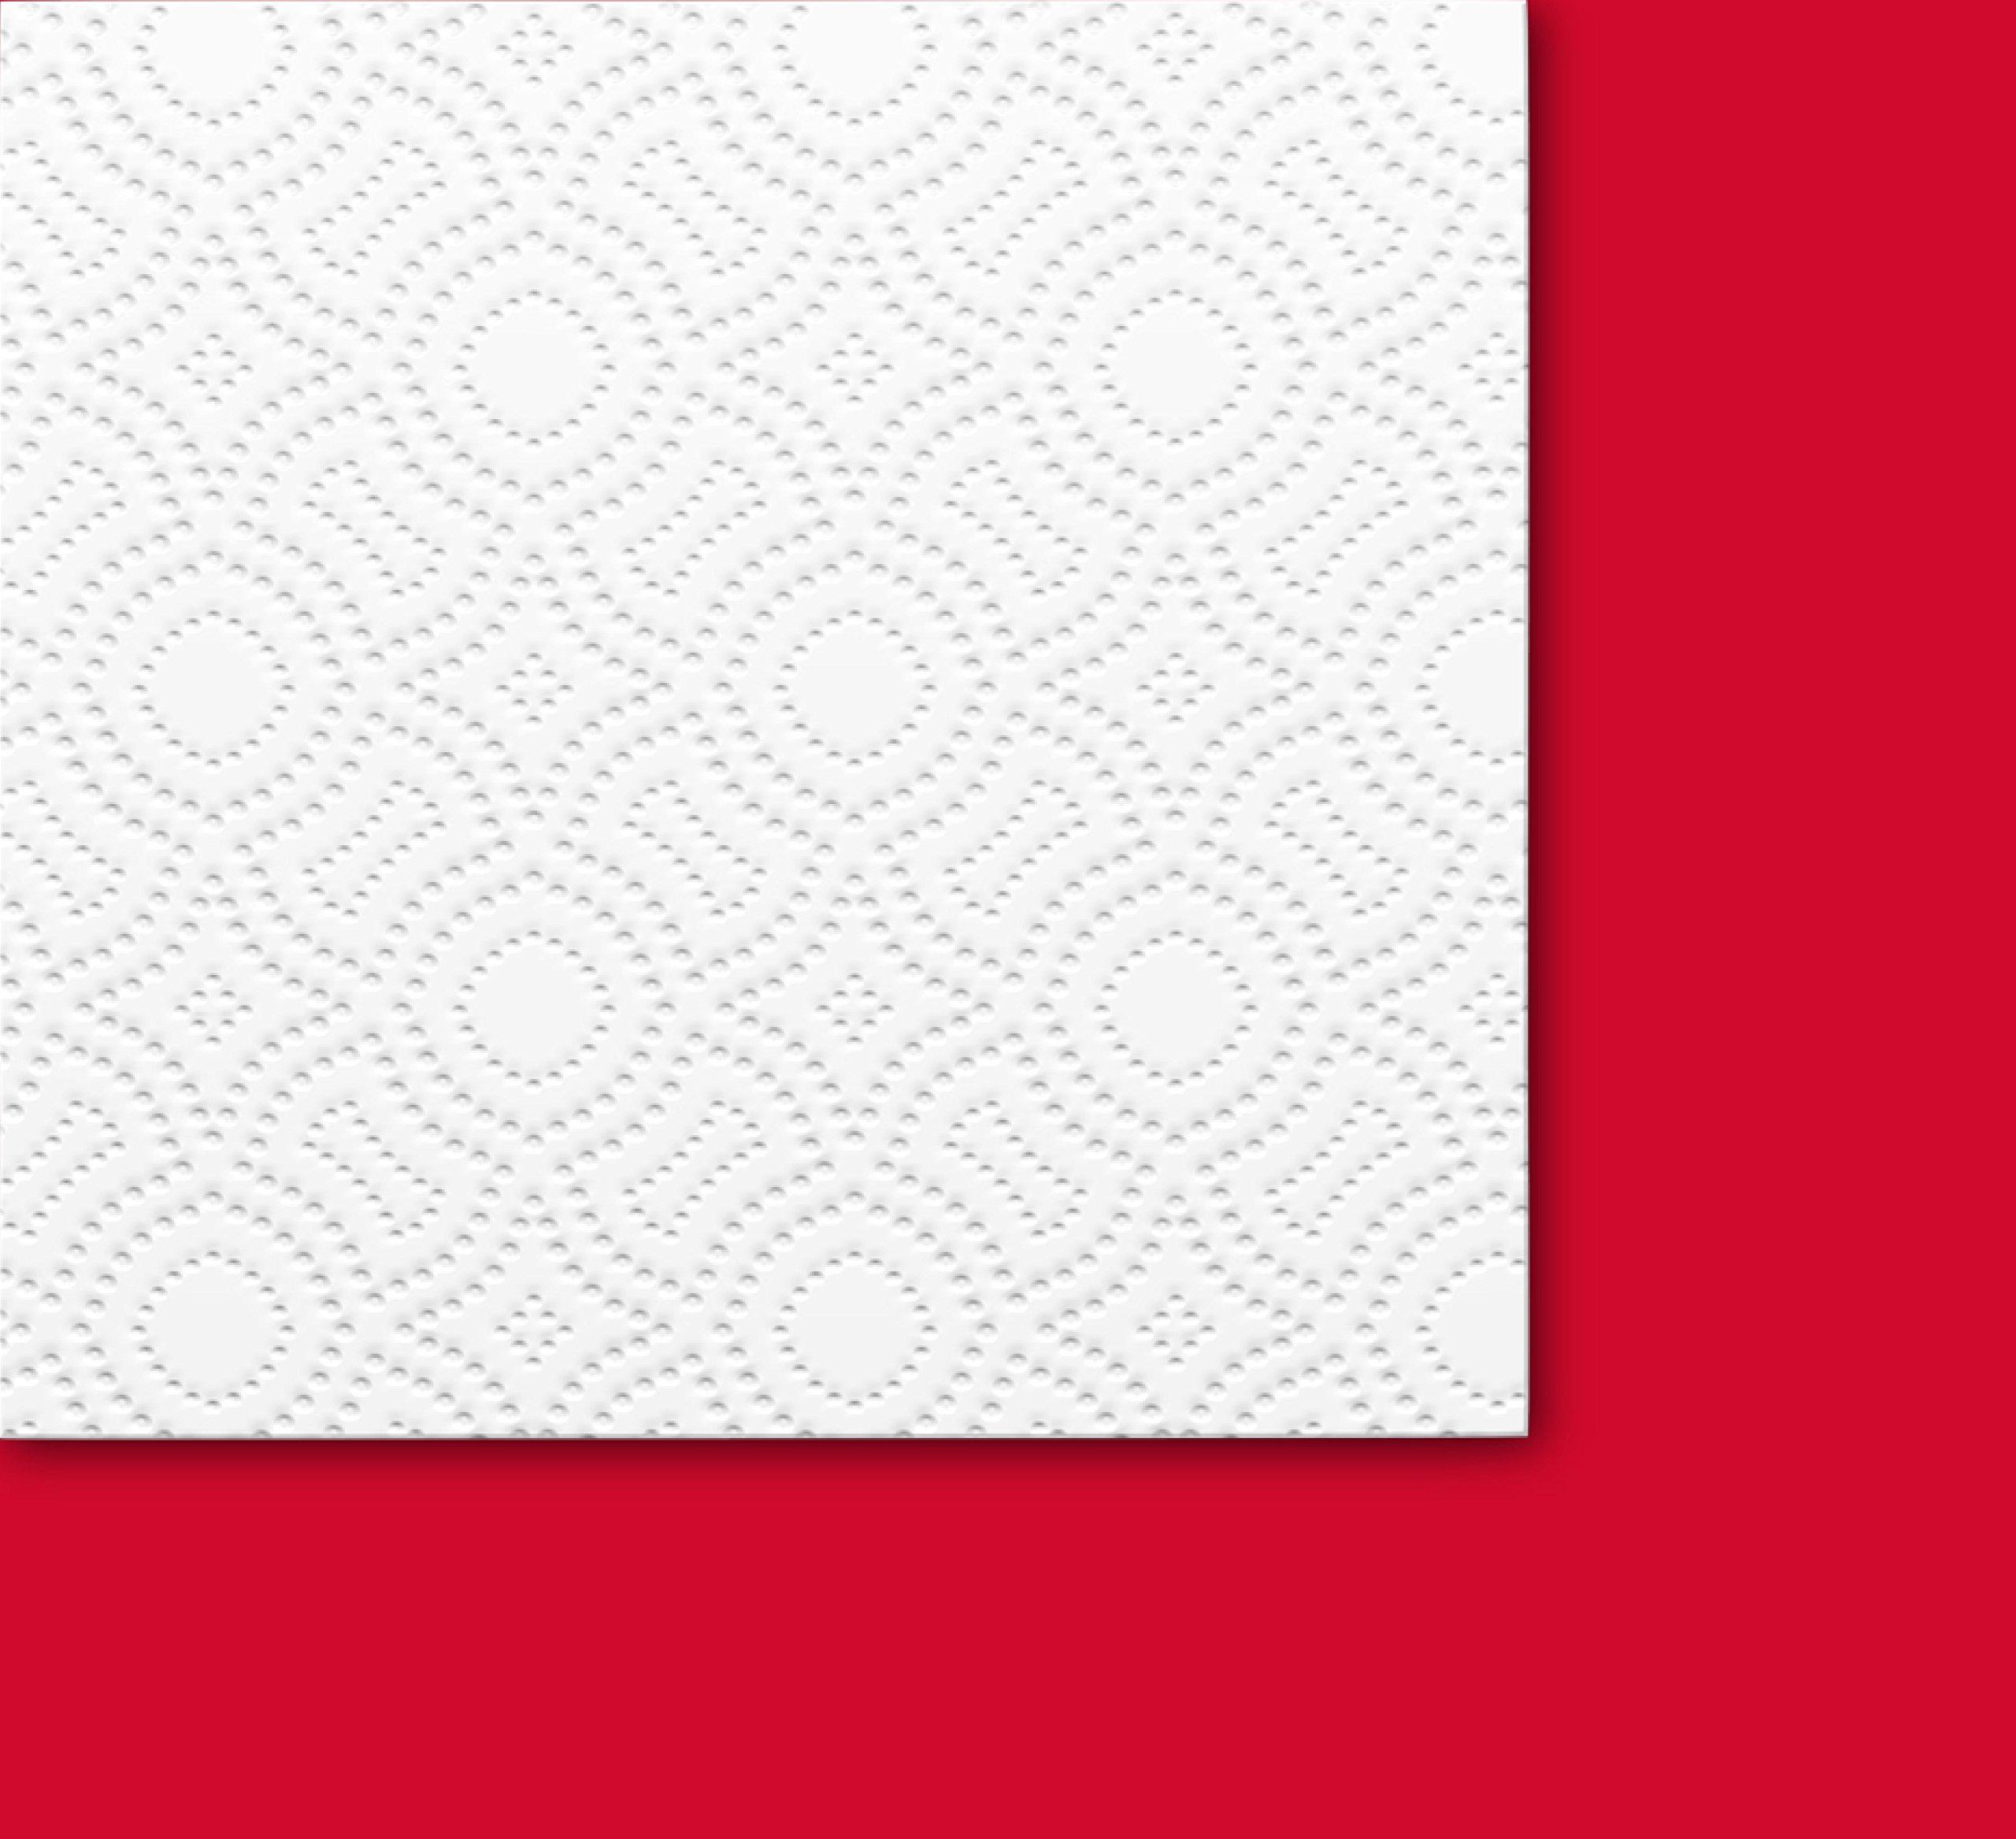 Brawny Pick-a-Size Paper Towels, 16XL Rolls by Brawny (Image #3)